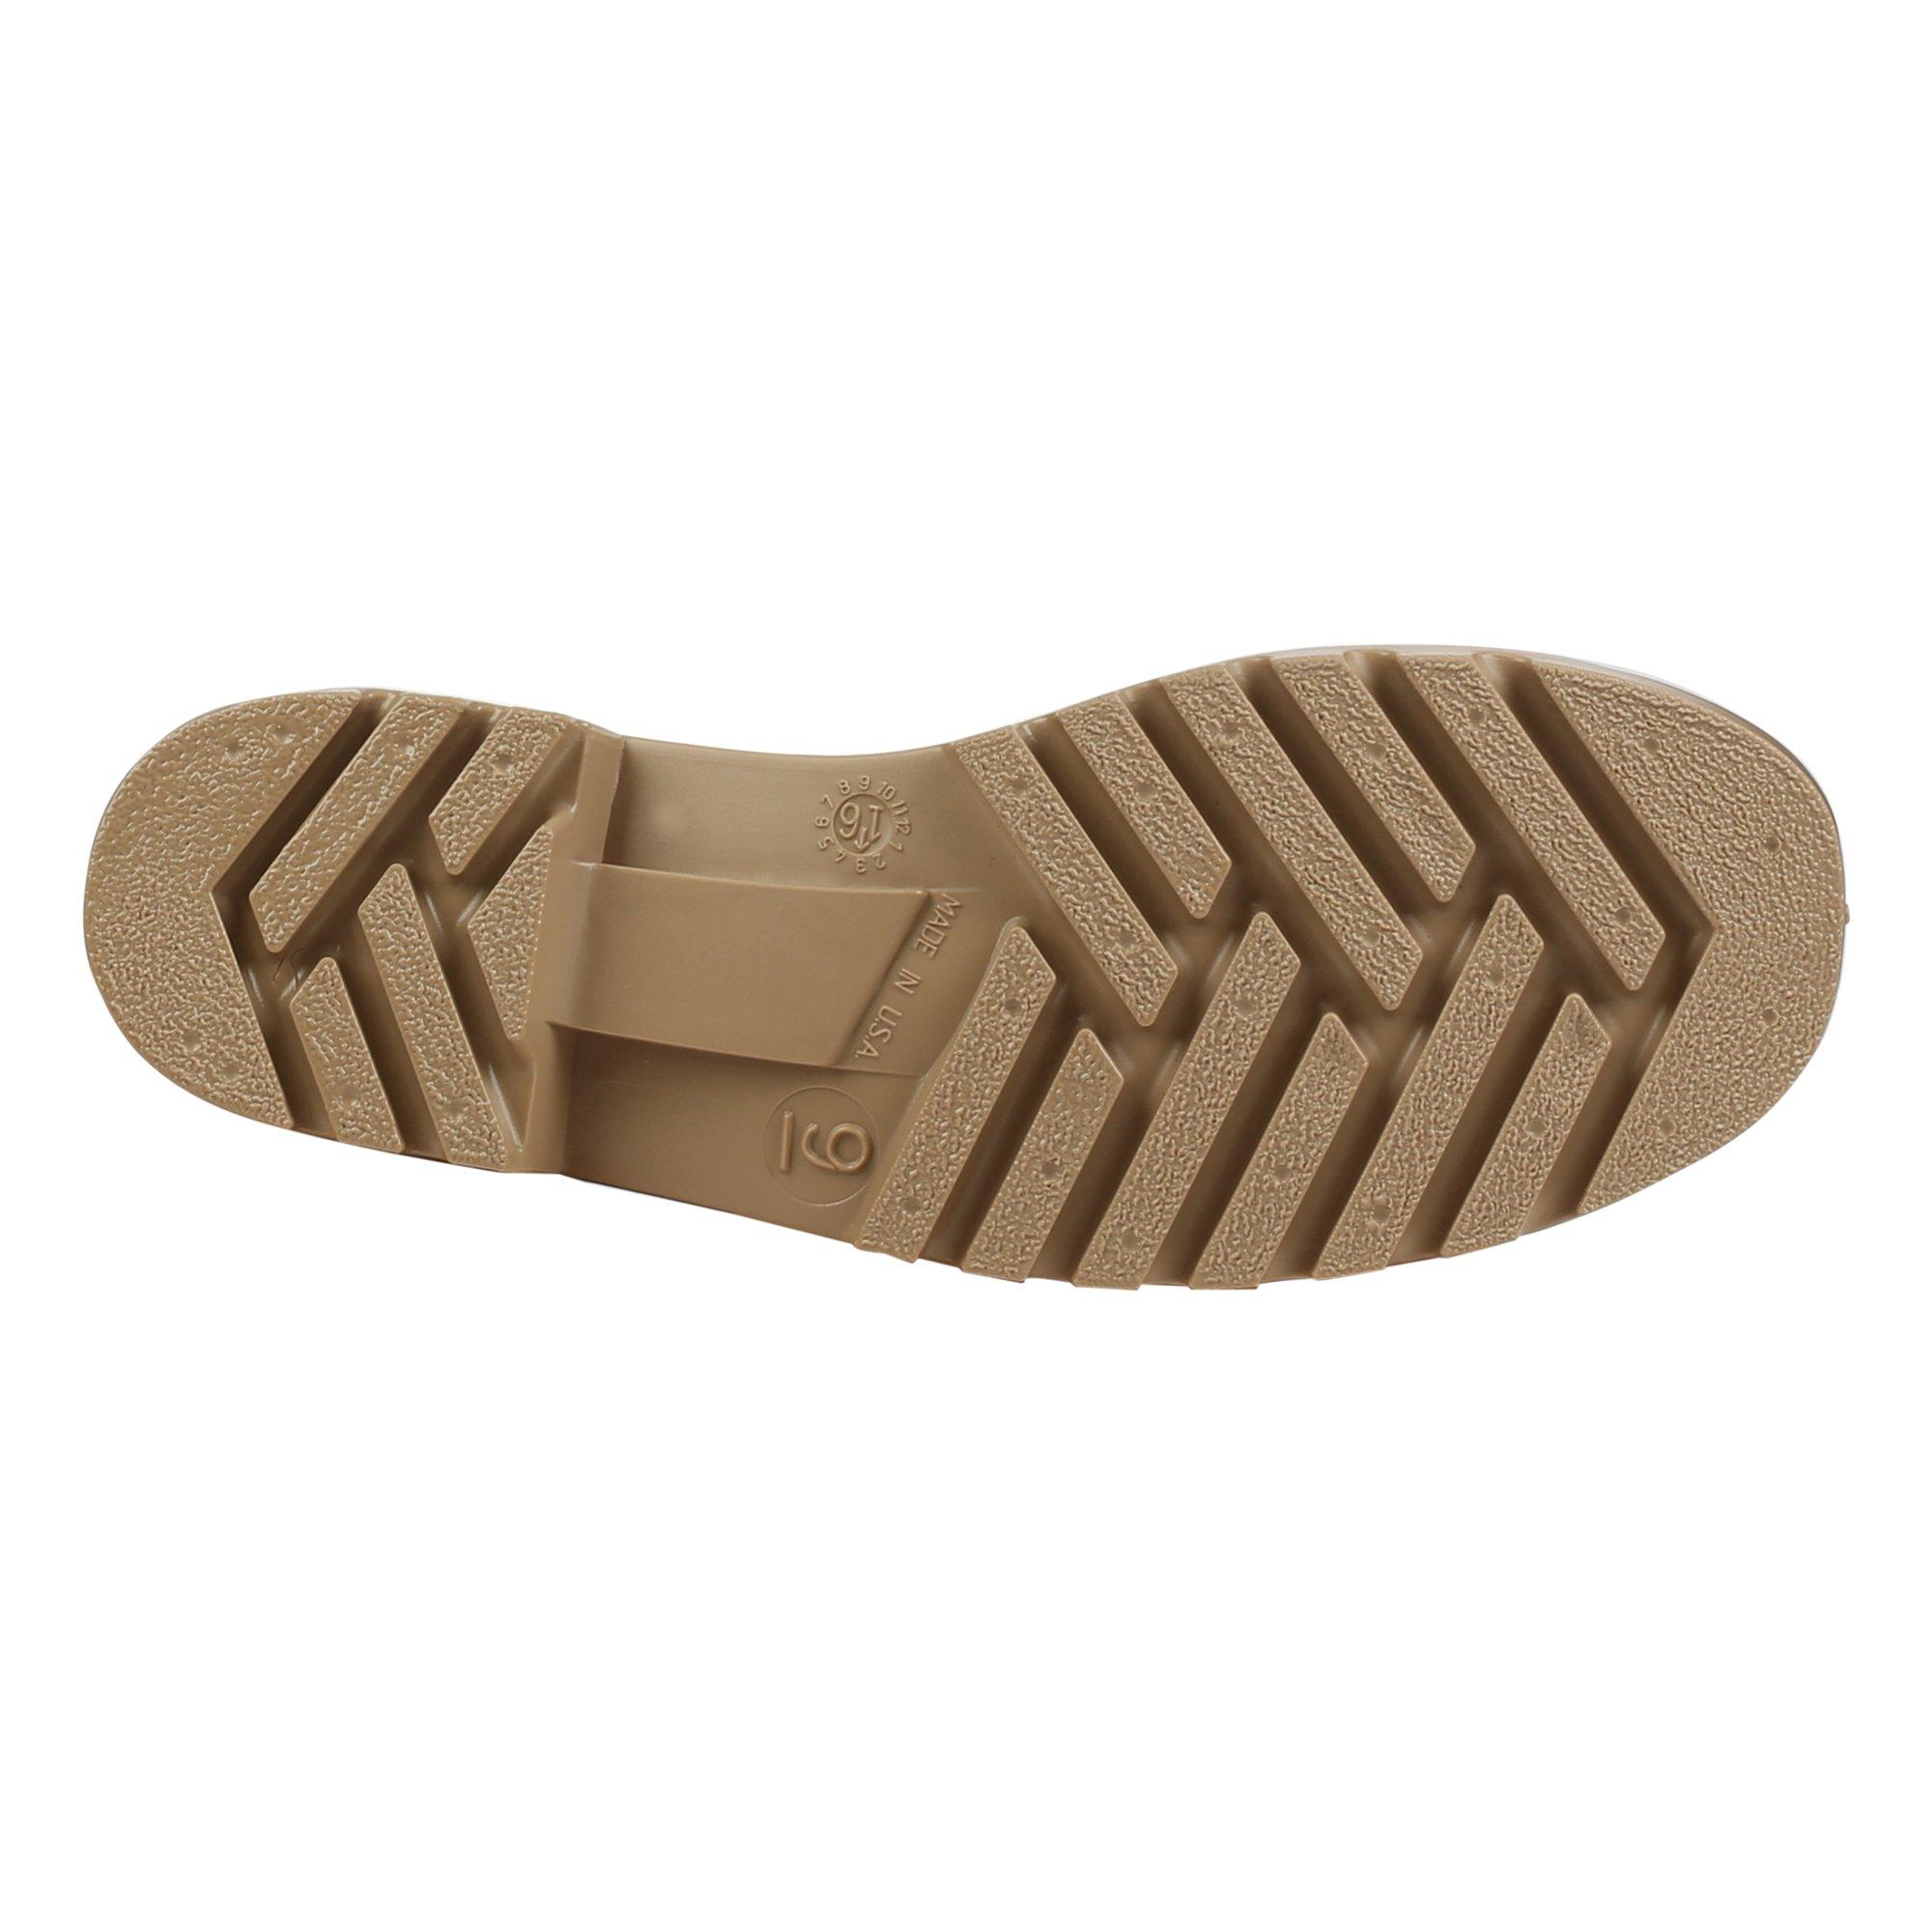 Servus 12'' PVC Polyblend Soft Toe Shrimp Boots, White (74928) by Honeywell (Image #4)